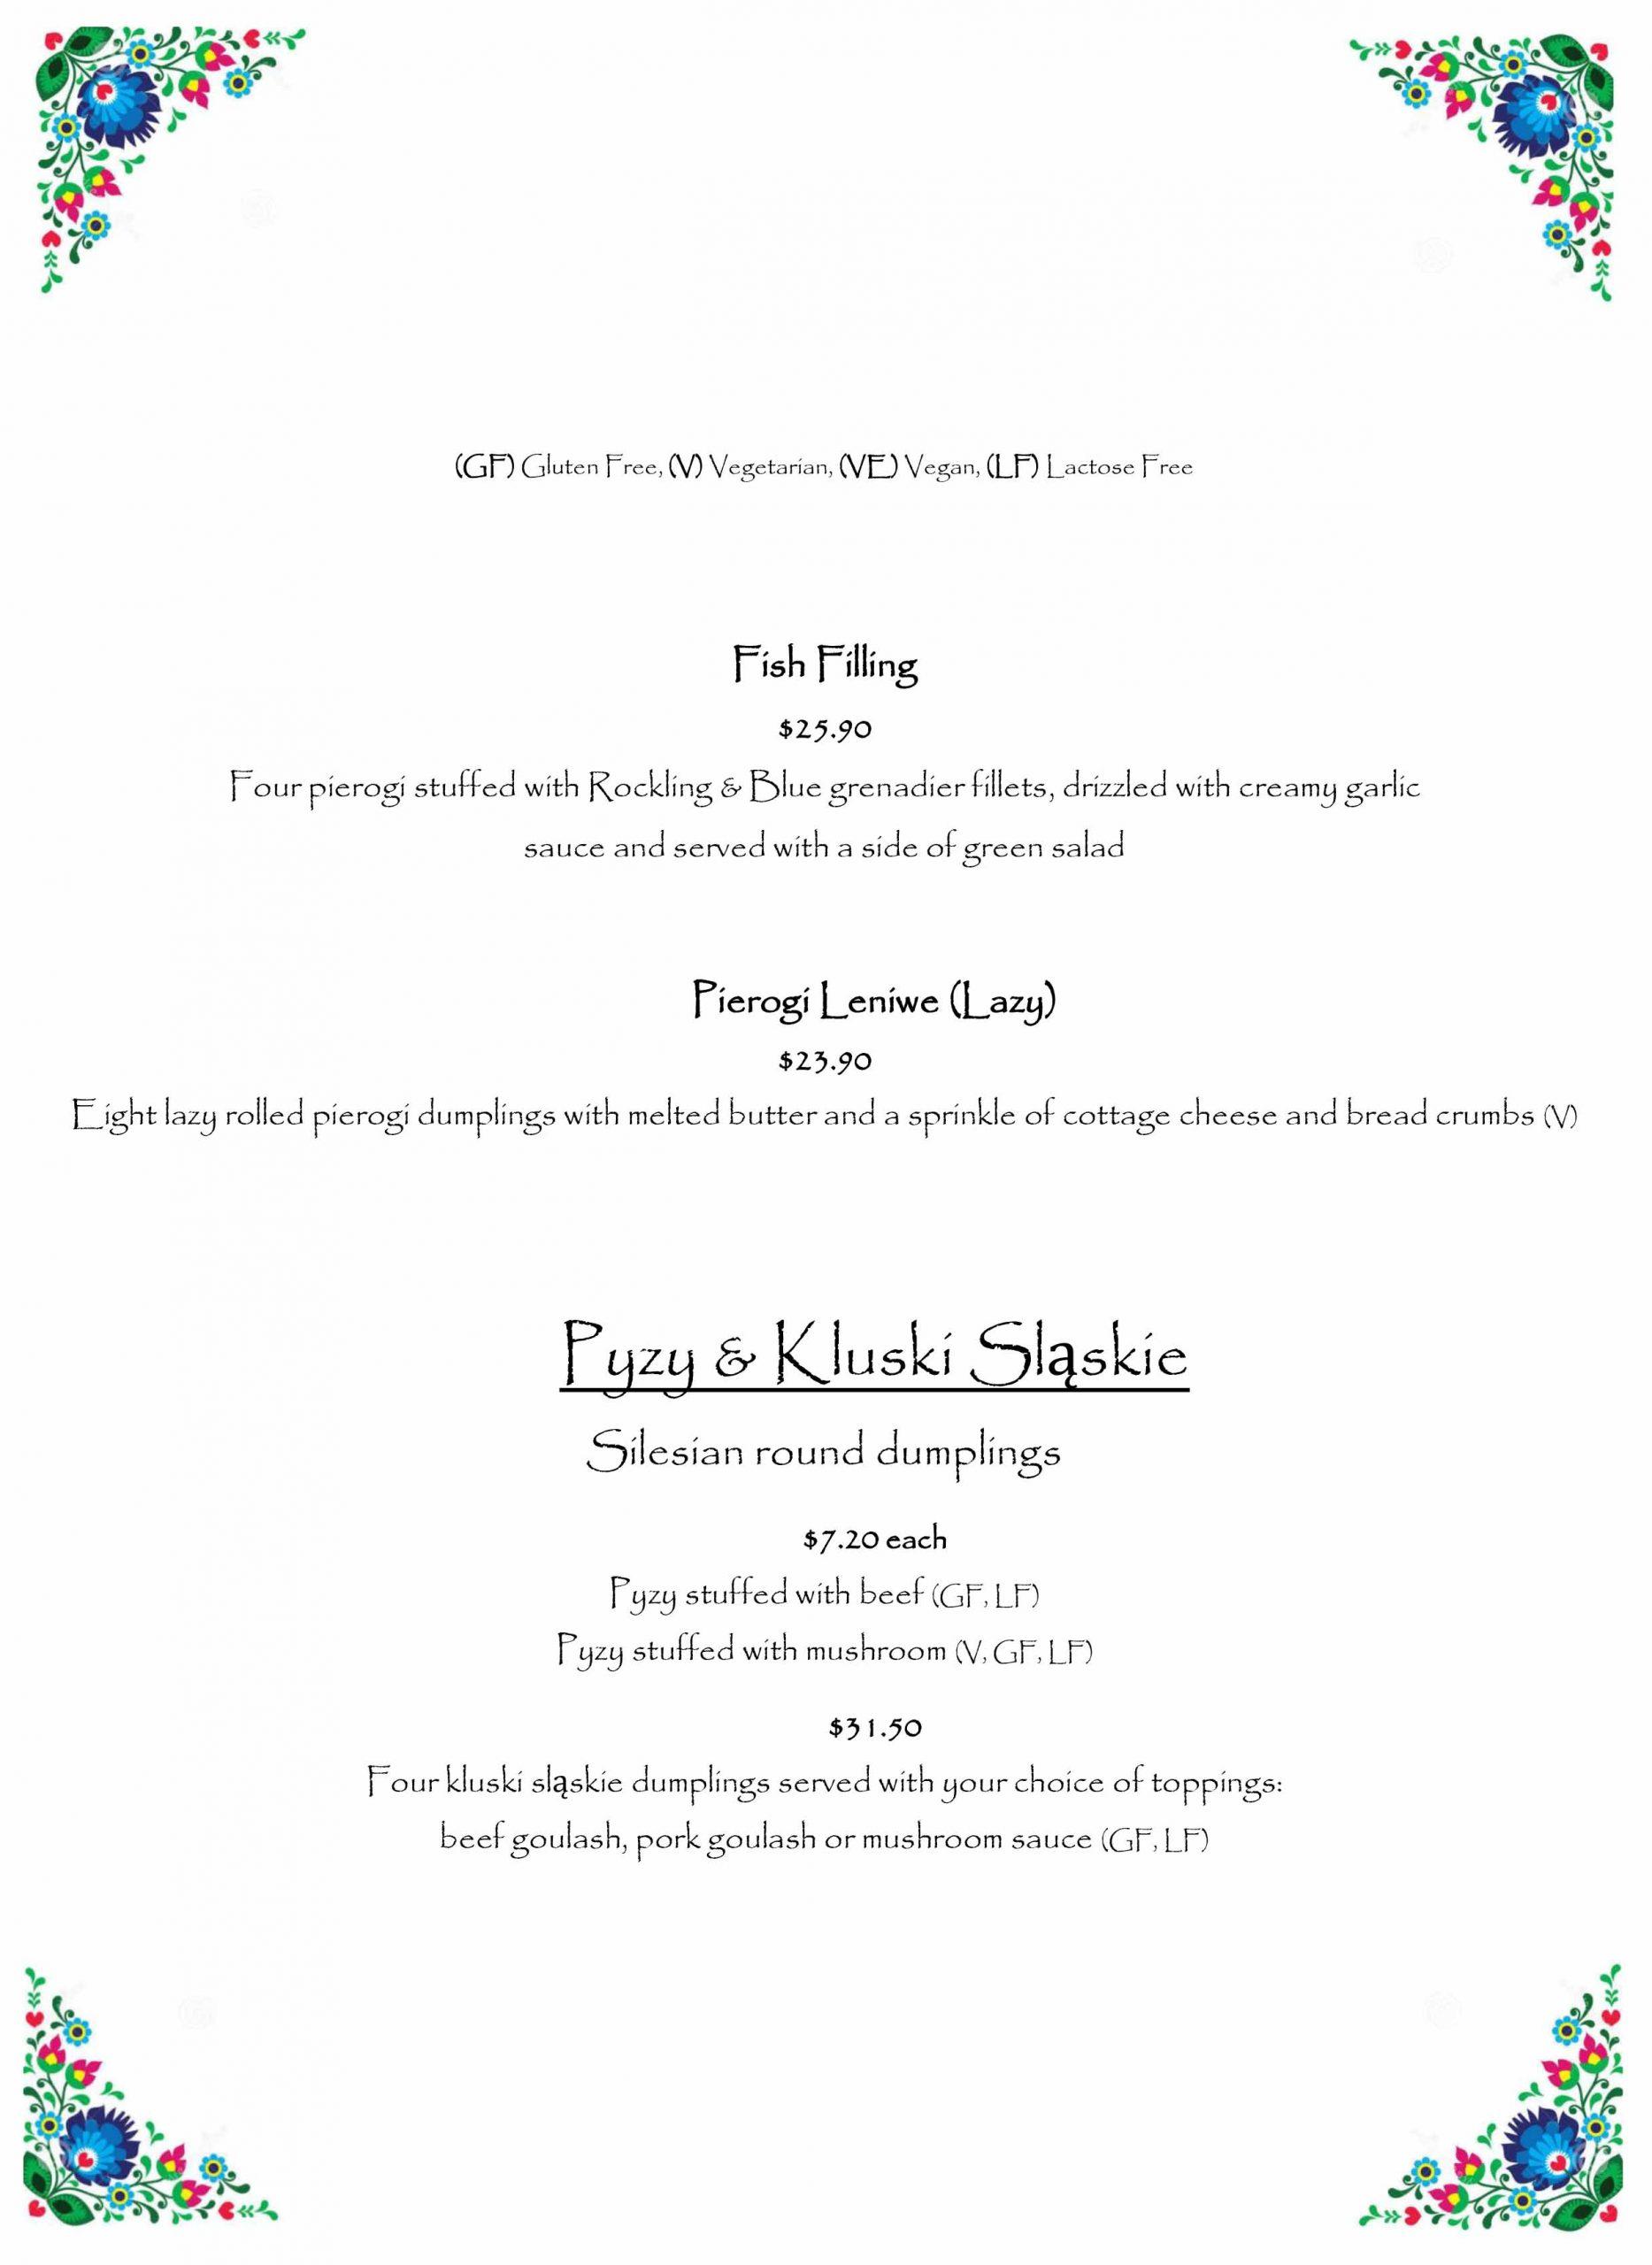 Menu - image KluskaRestaurant_Menu-Pyzy-Kluski-Slaskie-scaled on https://www.kluskarestaurant.com.au